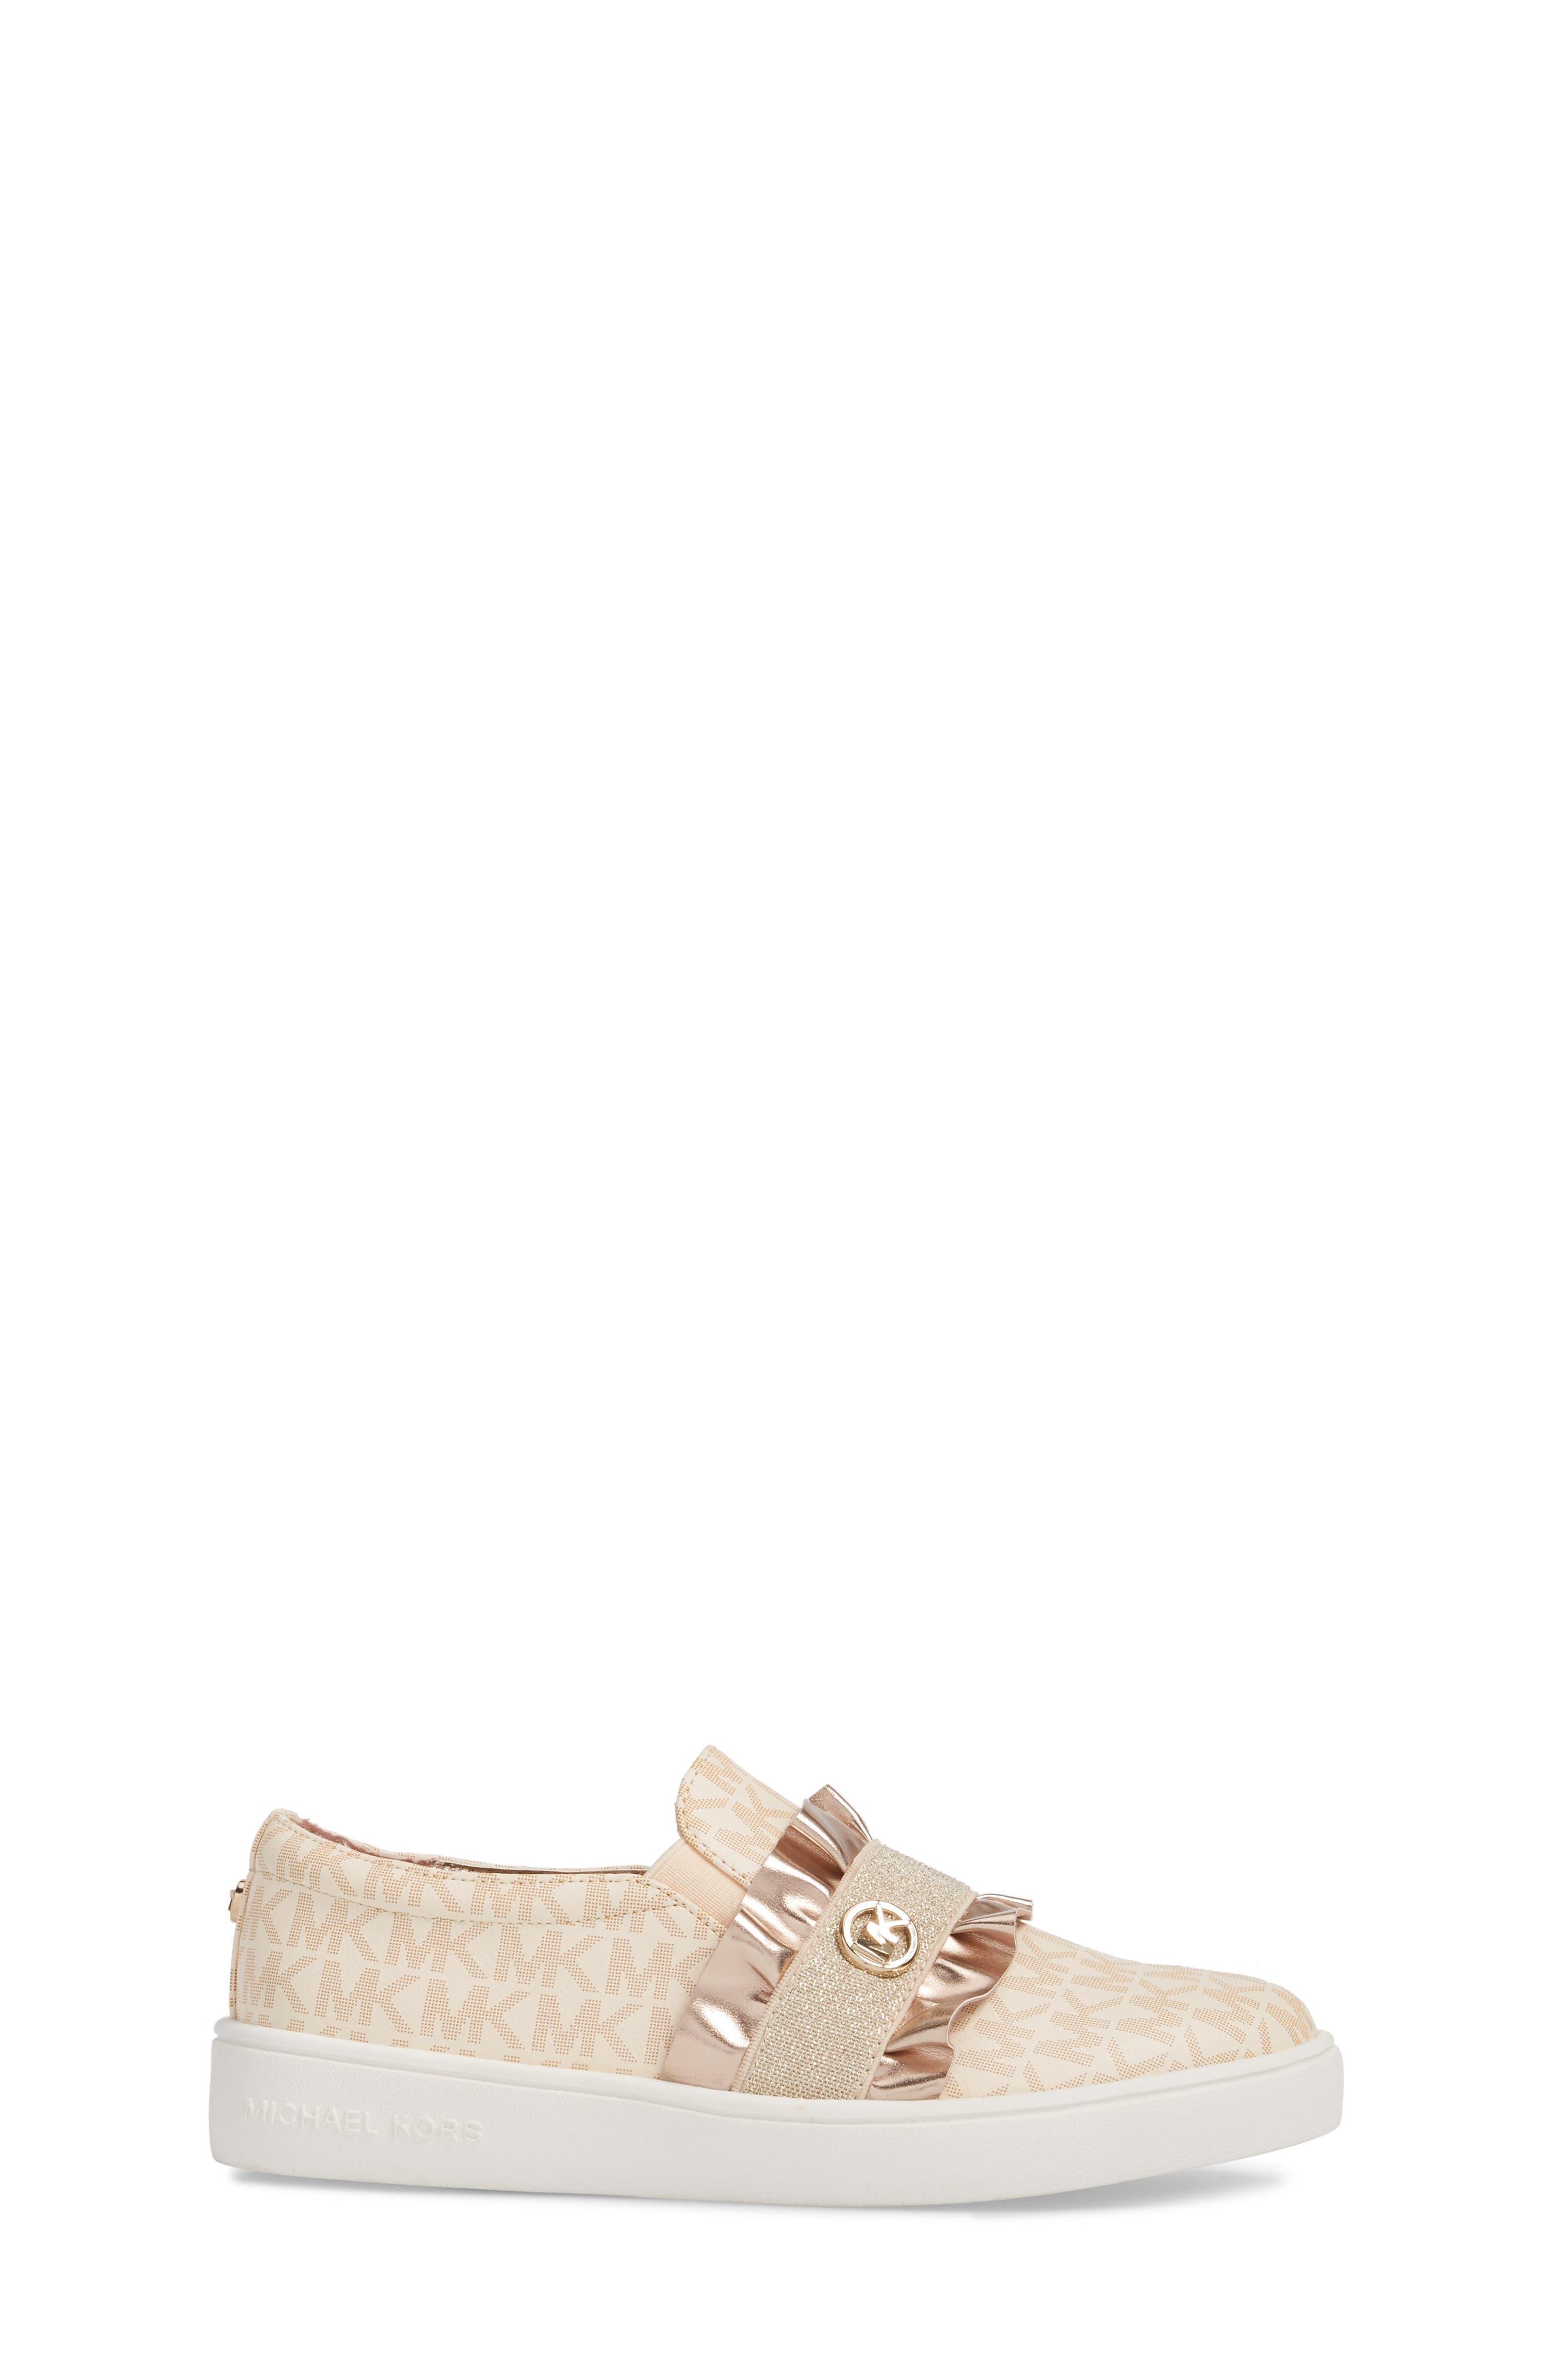 Ivy Riff Ruffle Sneaker,                             Alternate thumbnail 3, color,                             Rose Gold